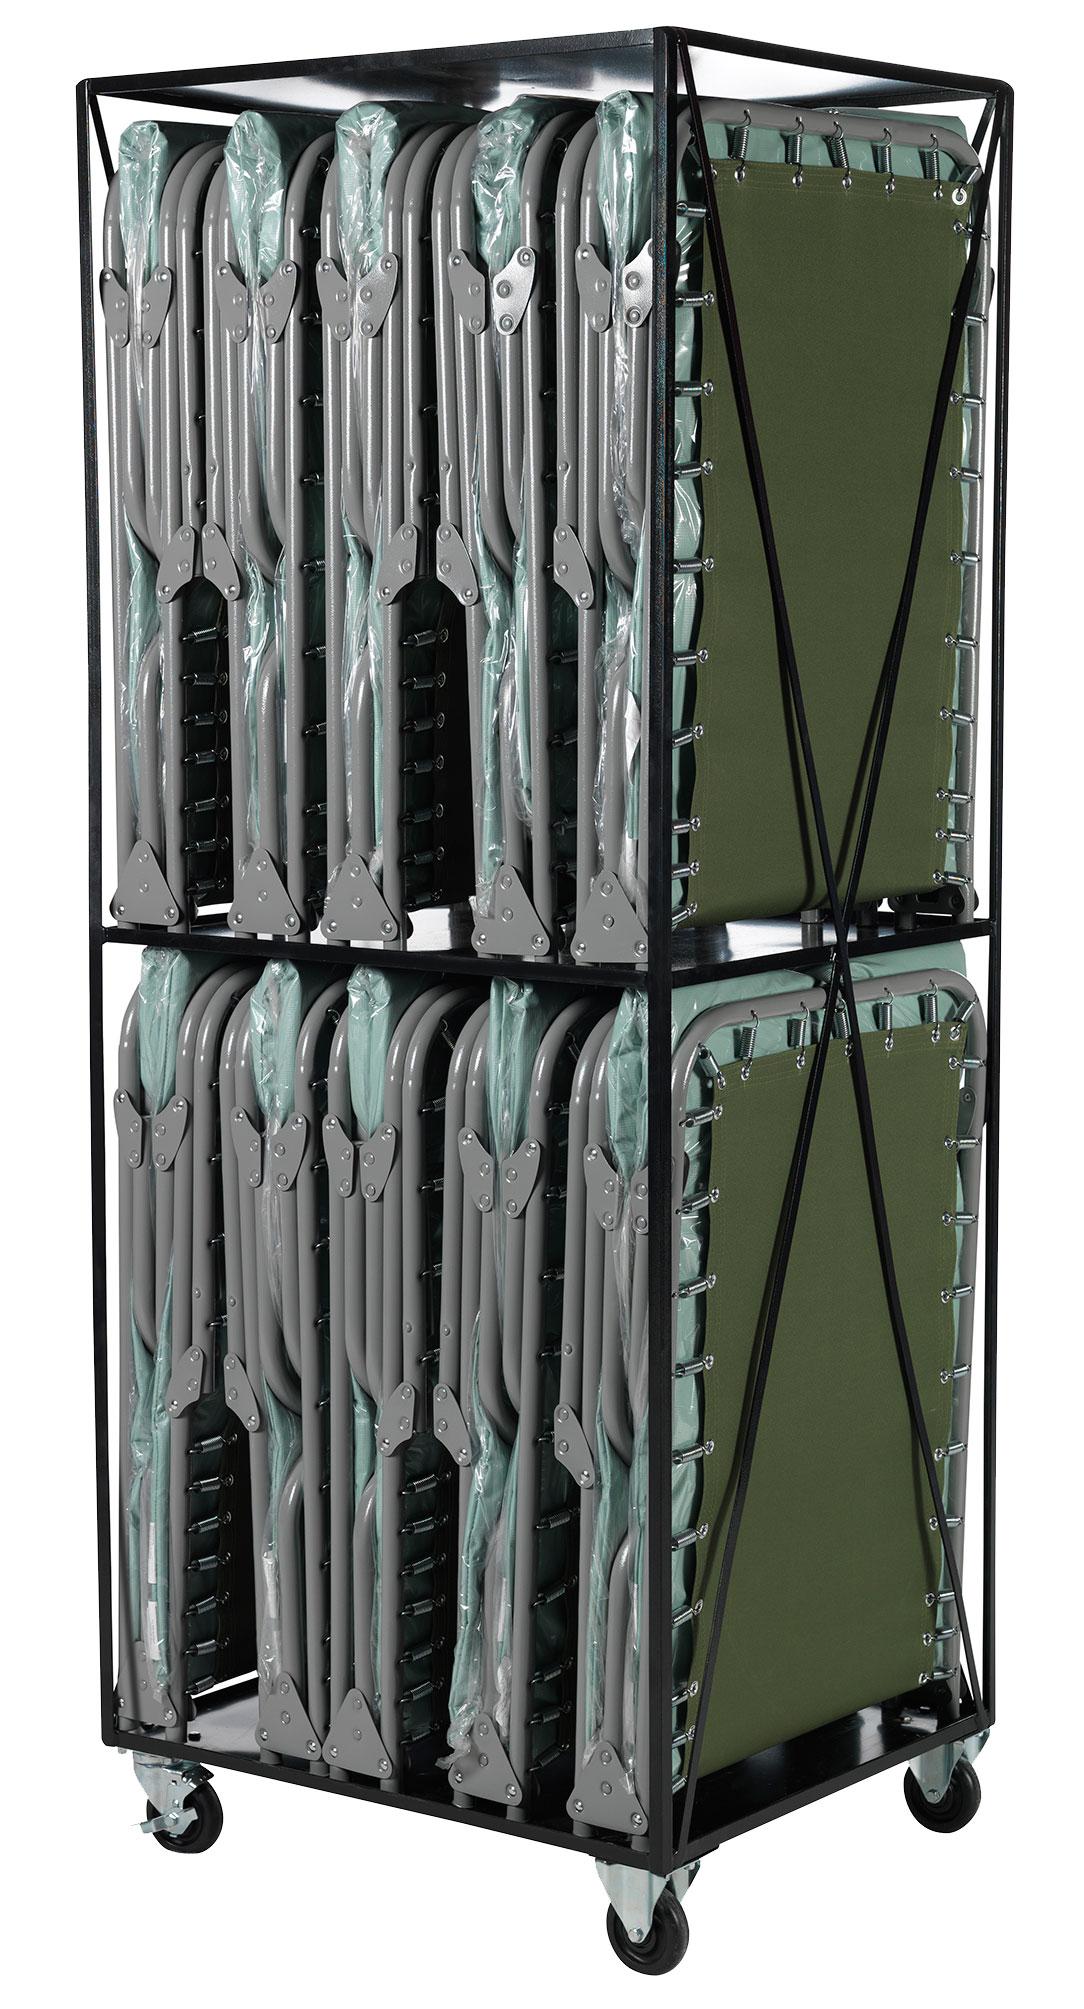 Blantex XM-3 Heavy Duty Steel Special Needs Cot with Vinyl Mat